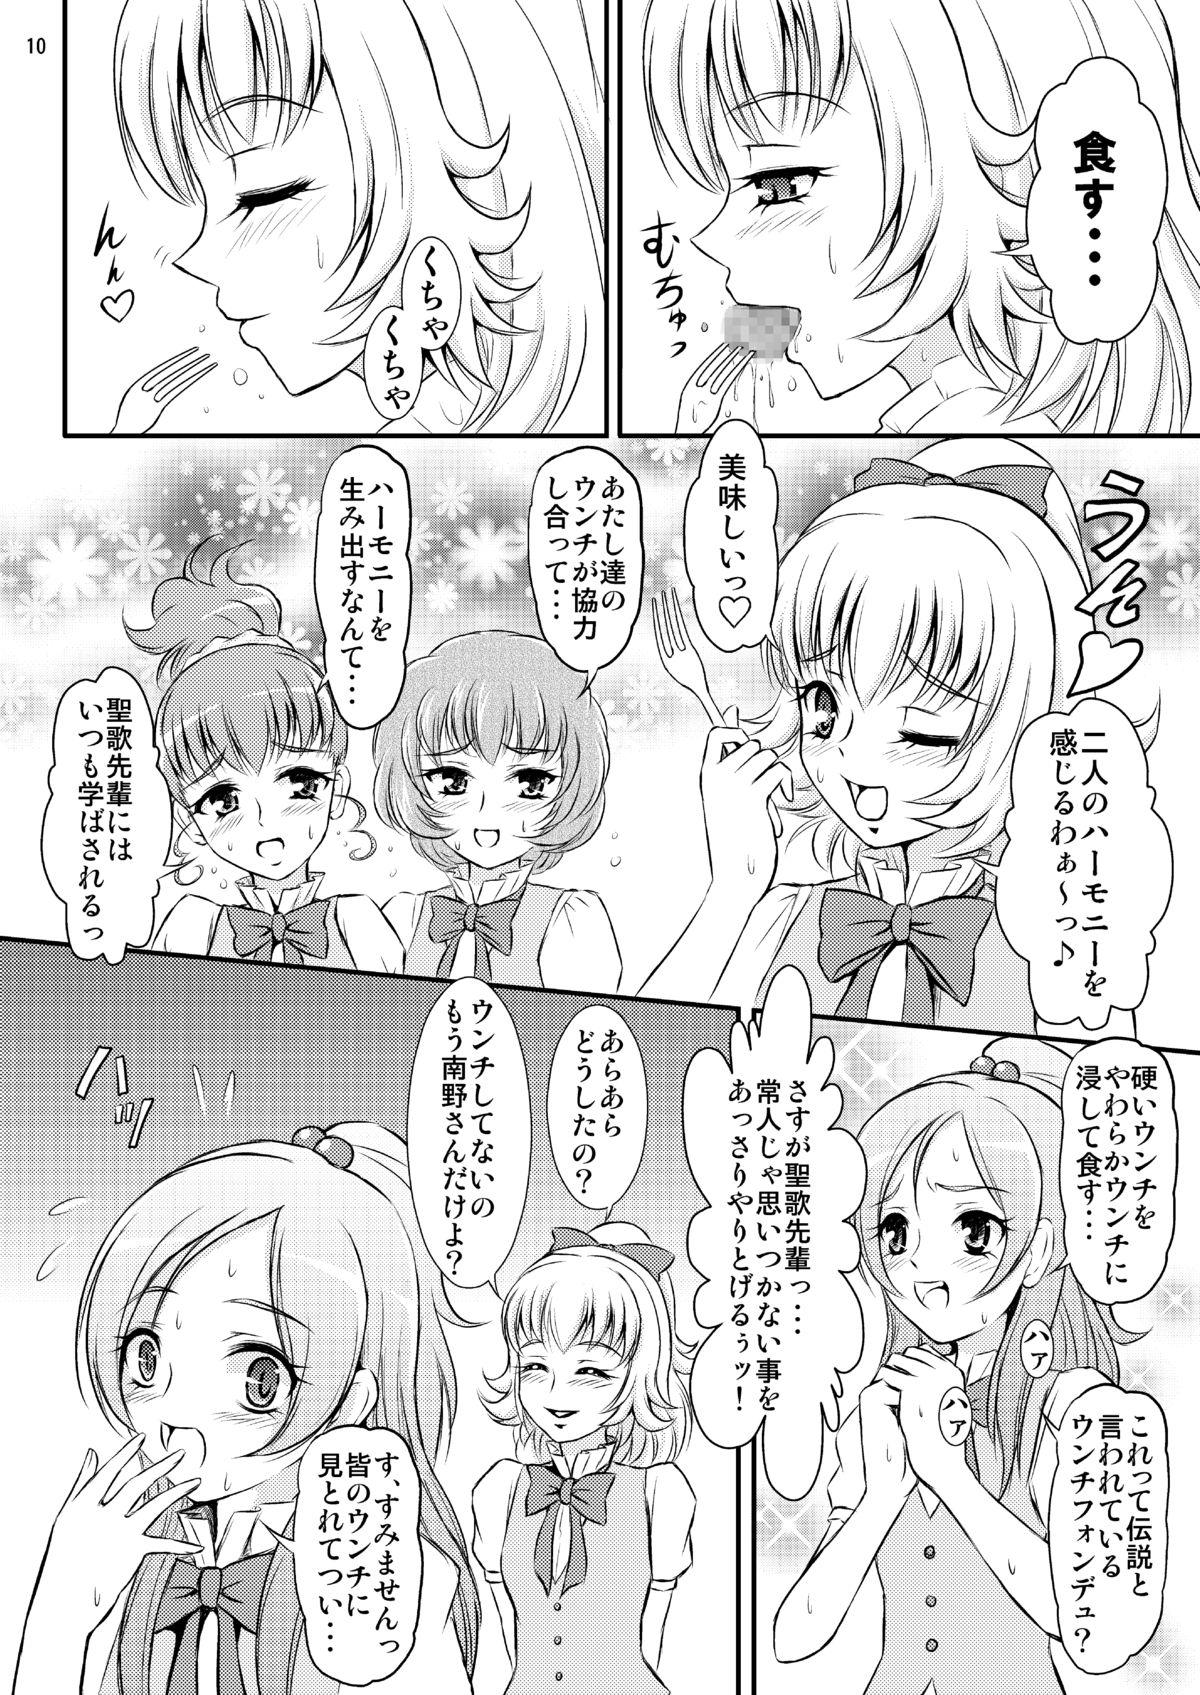 Sweets' Hime no Himitsu Recipe 10